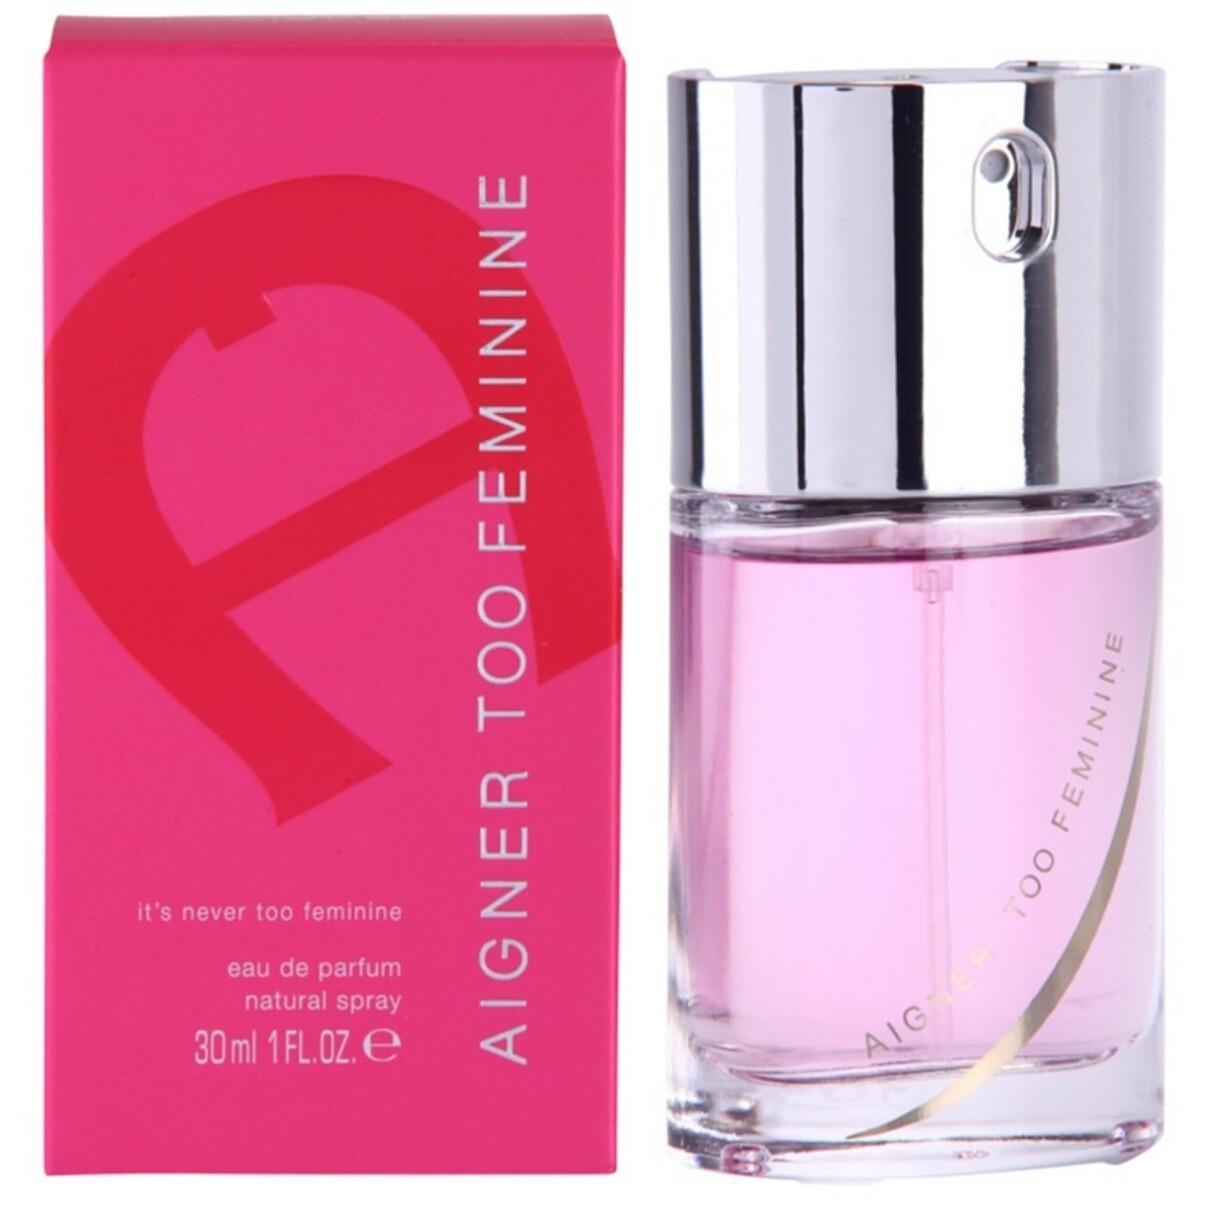 Aigner Too Feminine Eau de Perfume 30ml